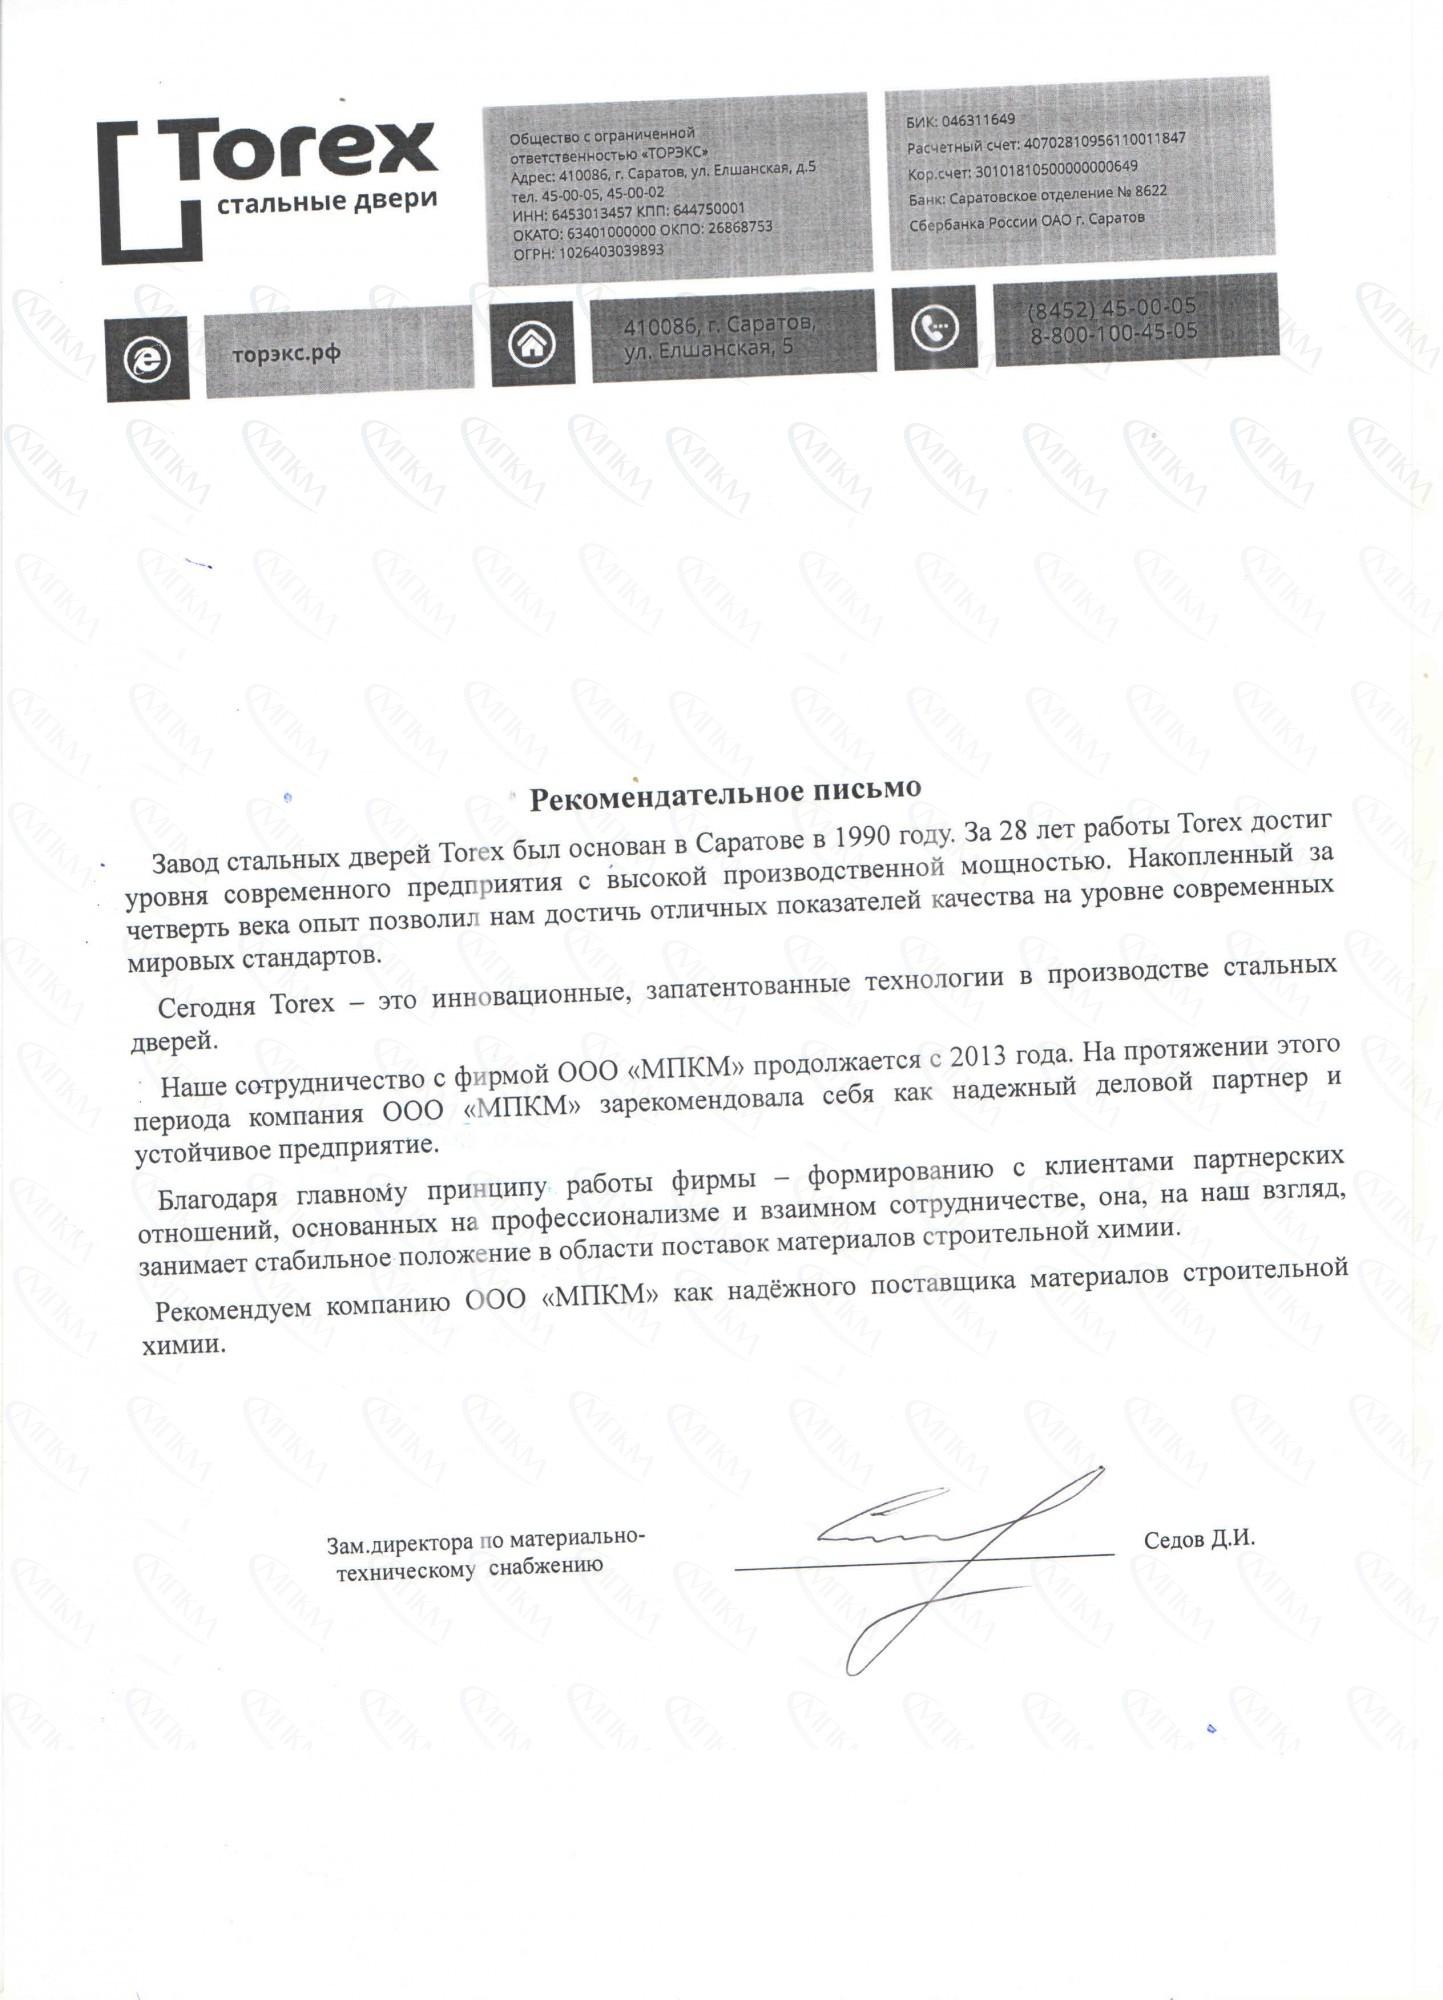 Отзыв Торекс ООО МПКМ